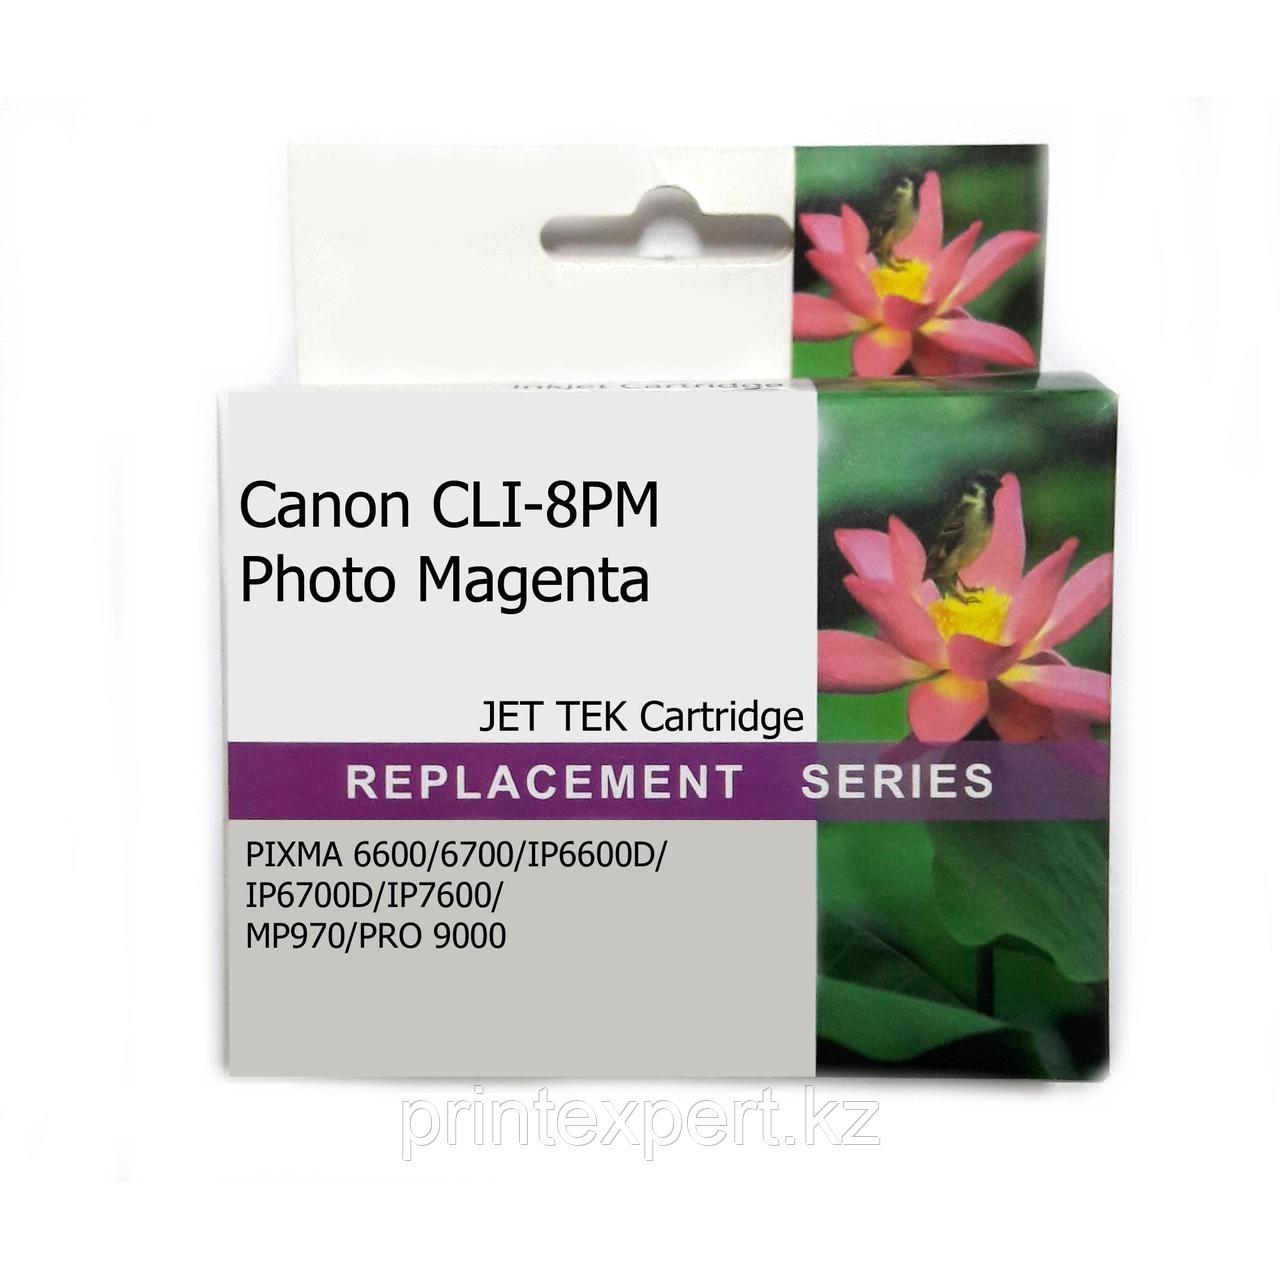 Картридж Canon CLI-8PM Photo Magenta JET TEK